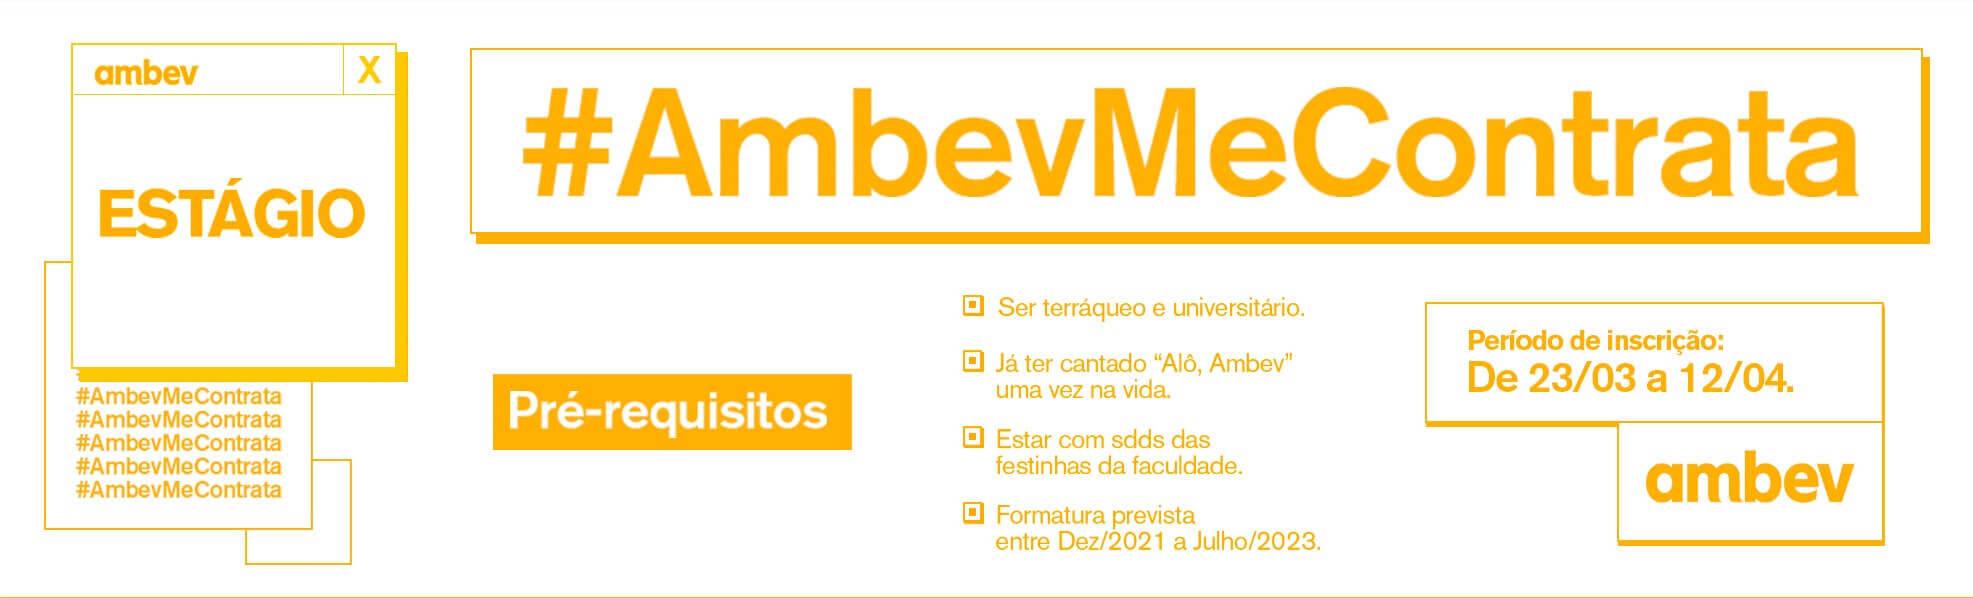 Ambev abre inscrições para programa de estágio